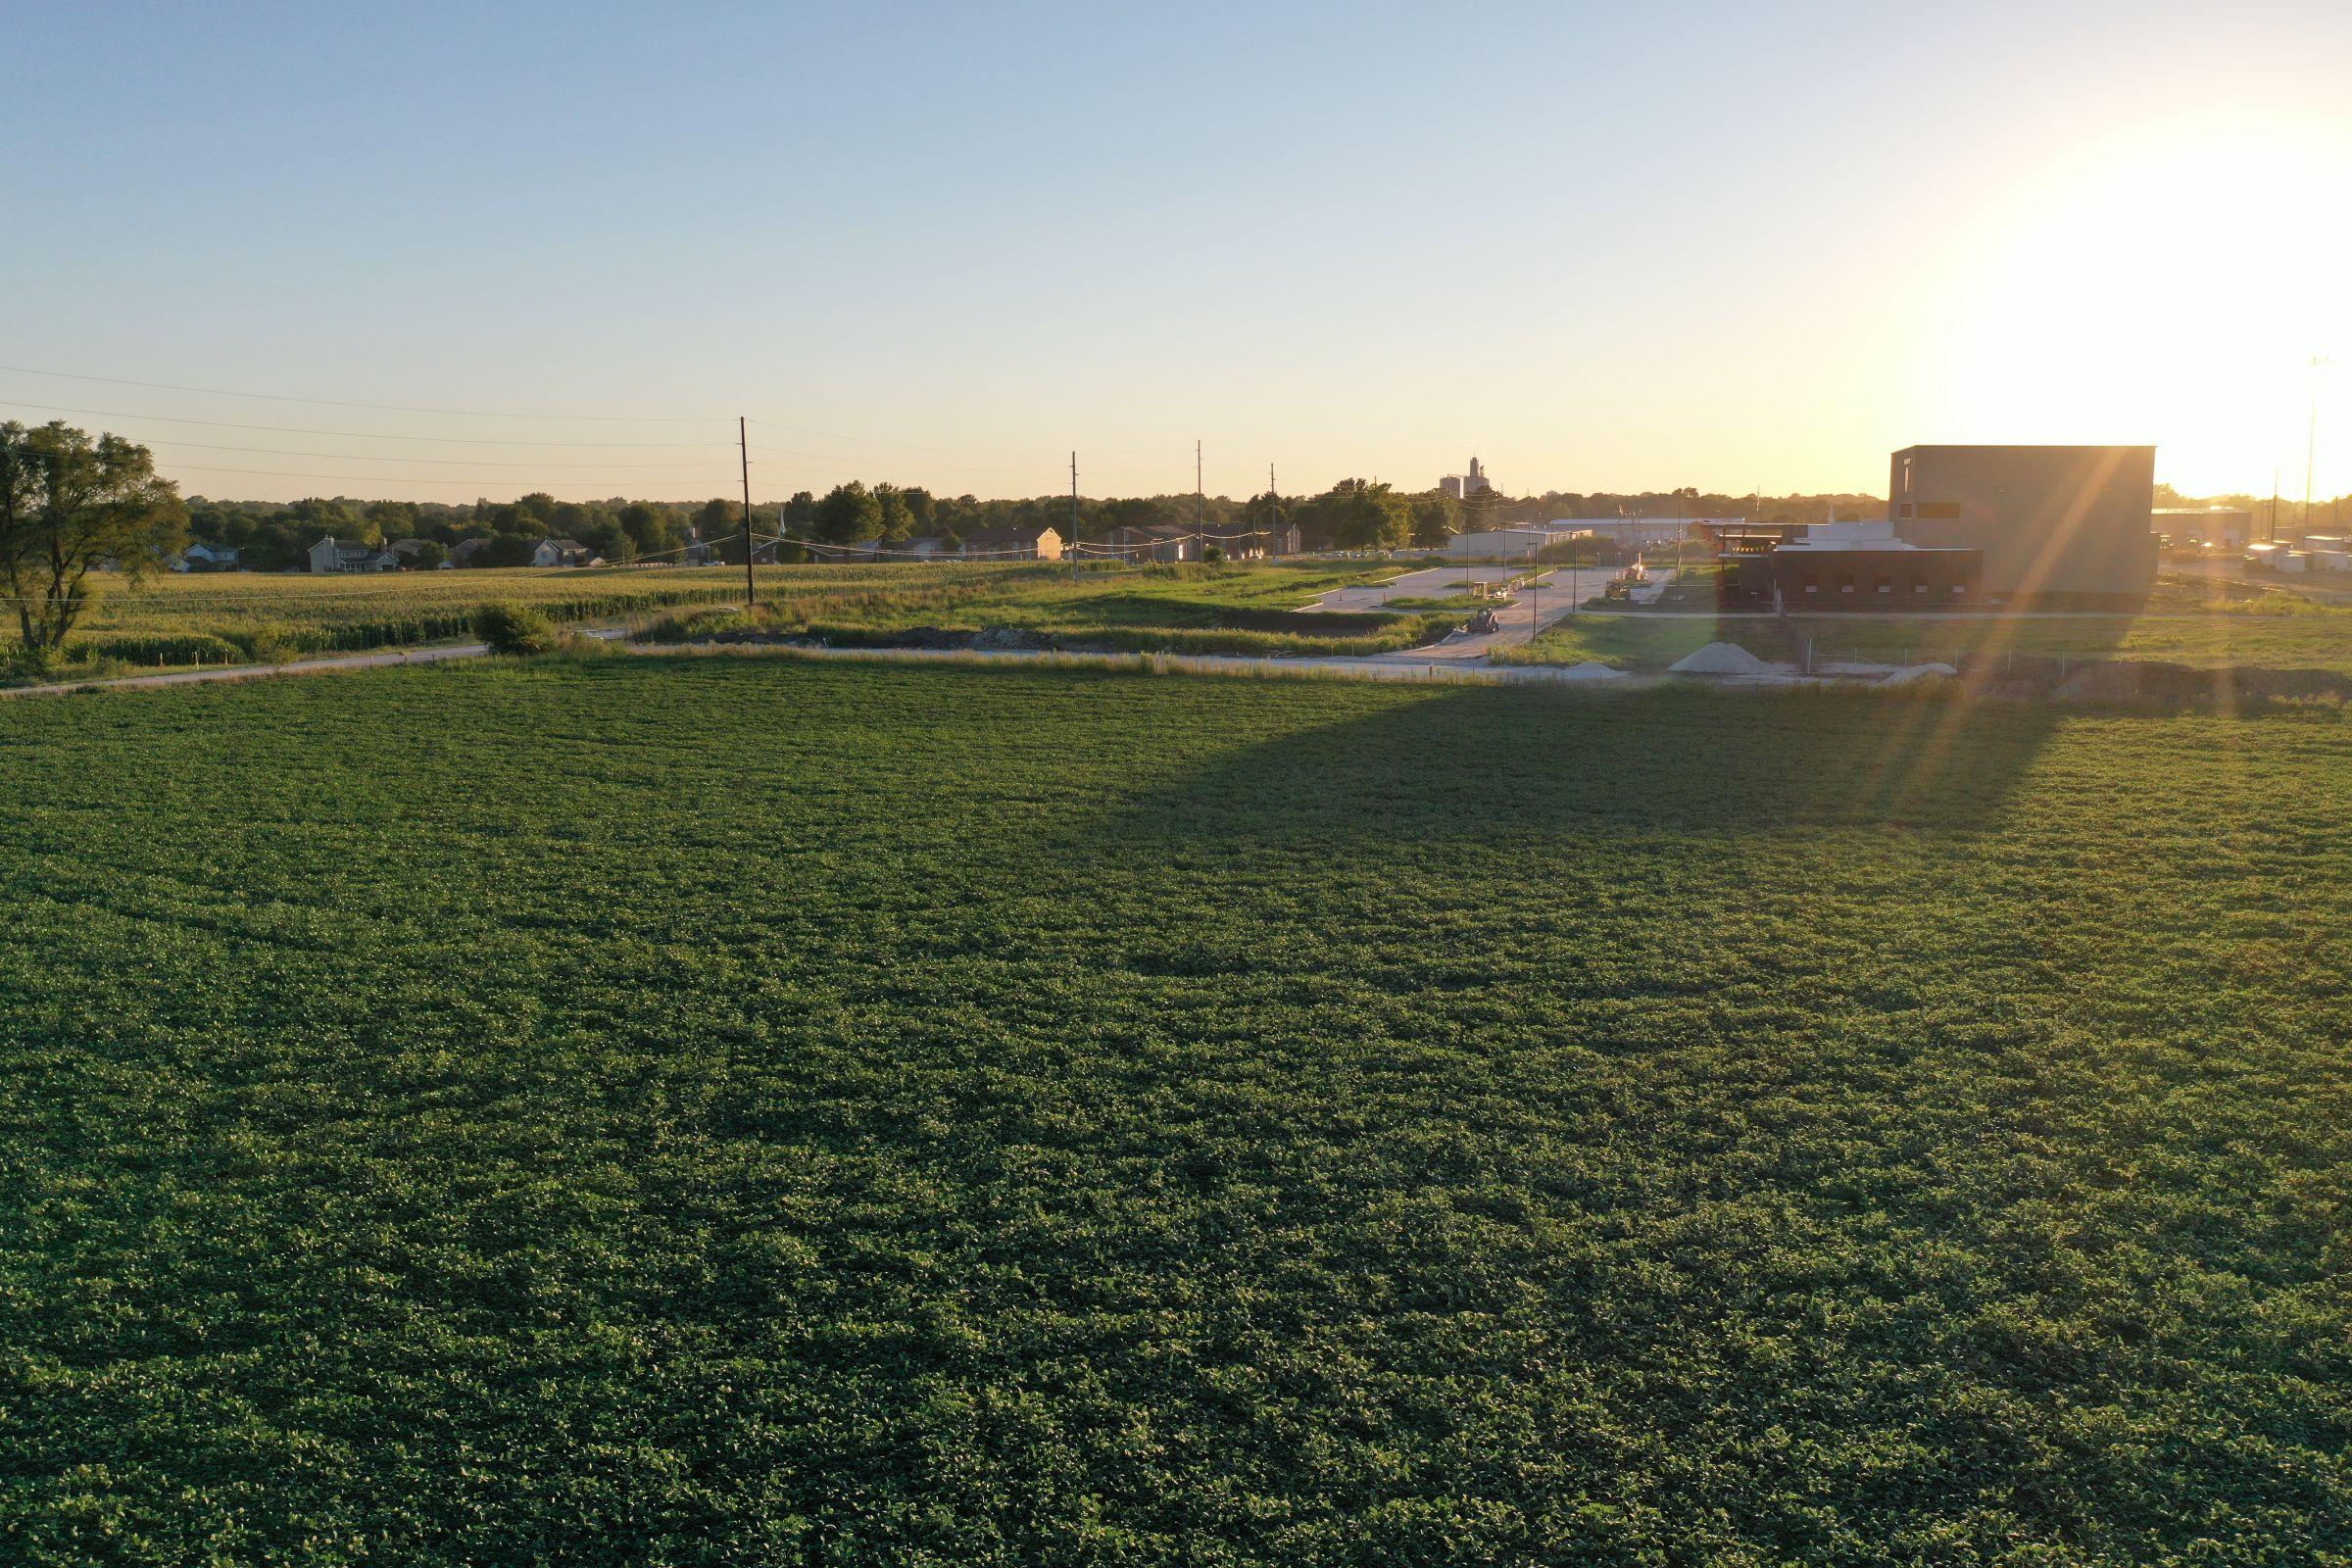 development-land-commercial-warren-county-iowa-50-acres-listing-number-15150-1-2020-08-31-131920.jpg